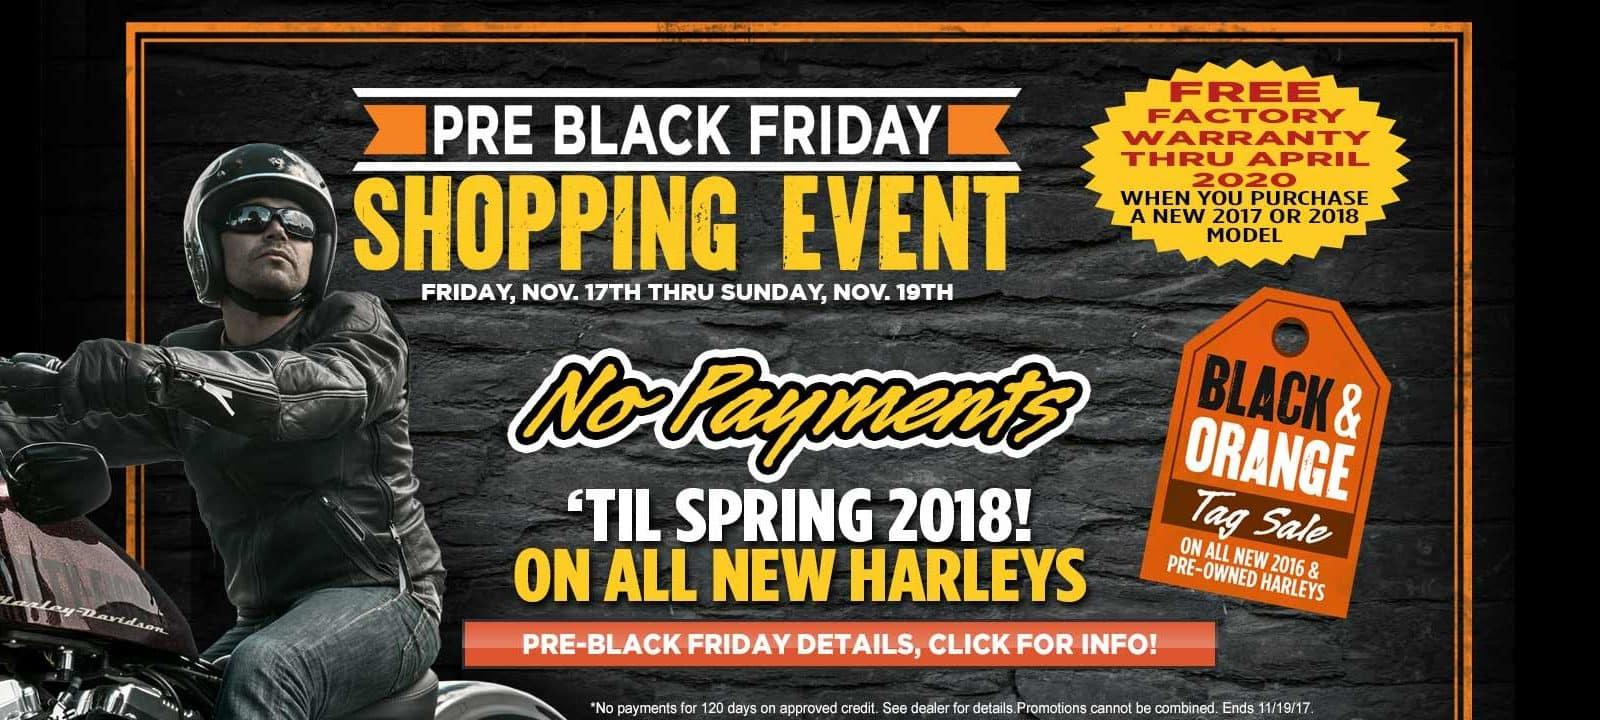 20171113-HOHD-1800x720-Pre-Black-Friday-Promo-1